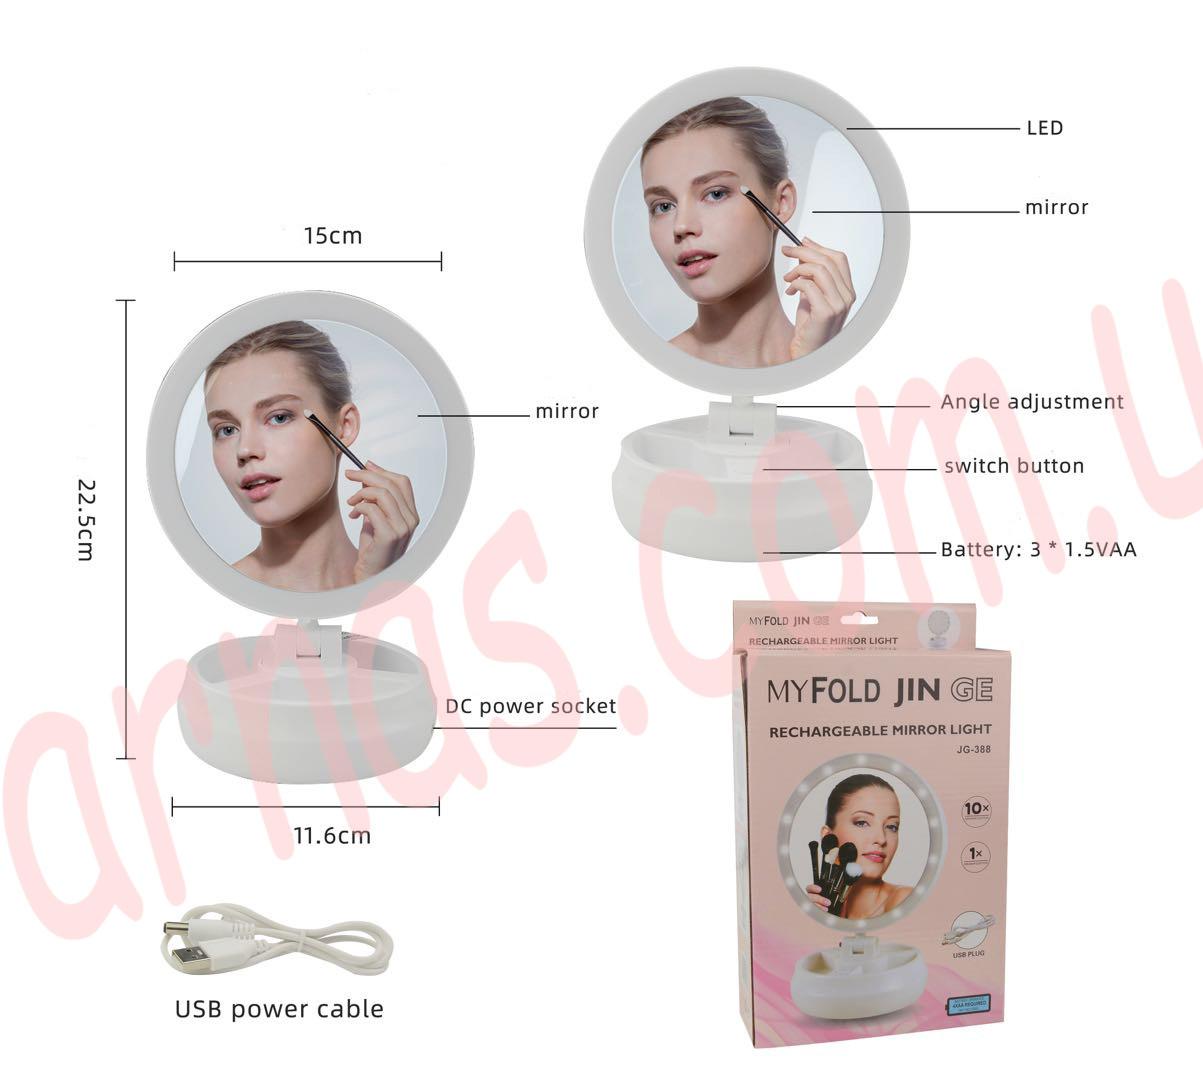 Зеркало для макияжа MyFold Jin Mirror (JG-388)